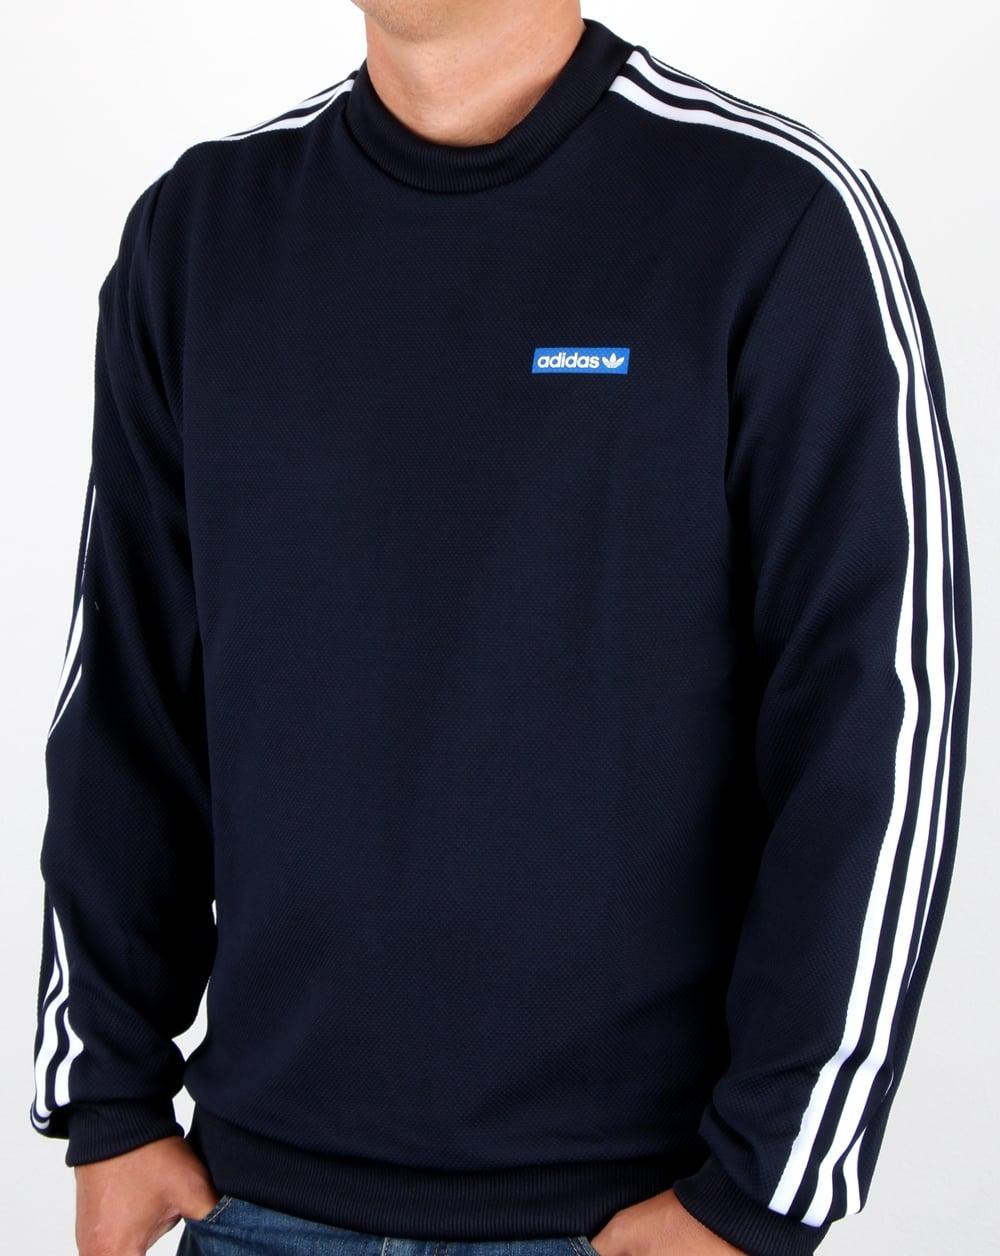 best sneakers cheap prices finest selection Adidas Originals Tennoji Sweat Legend Ink